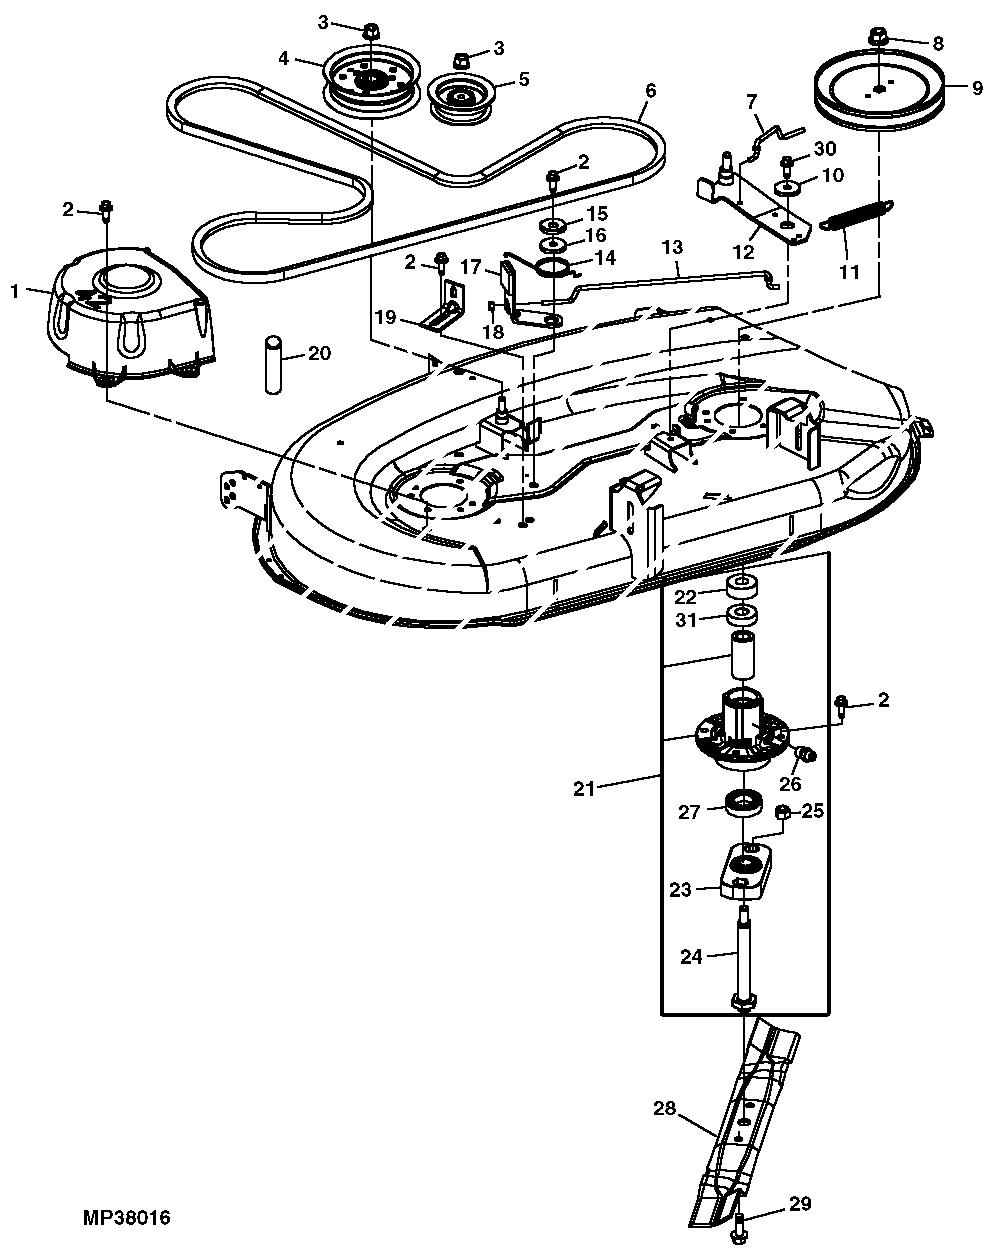 John Deere L110 Deck Parts Tractor Wiring Harness Diagram Model Lawn Greenpartstore